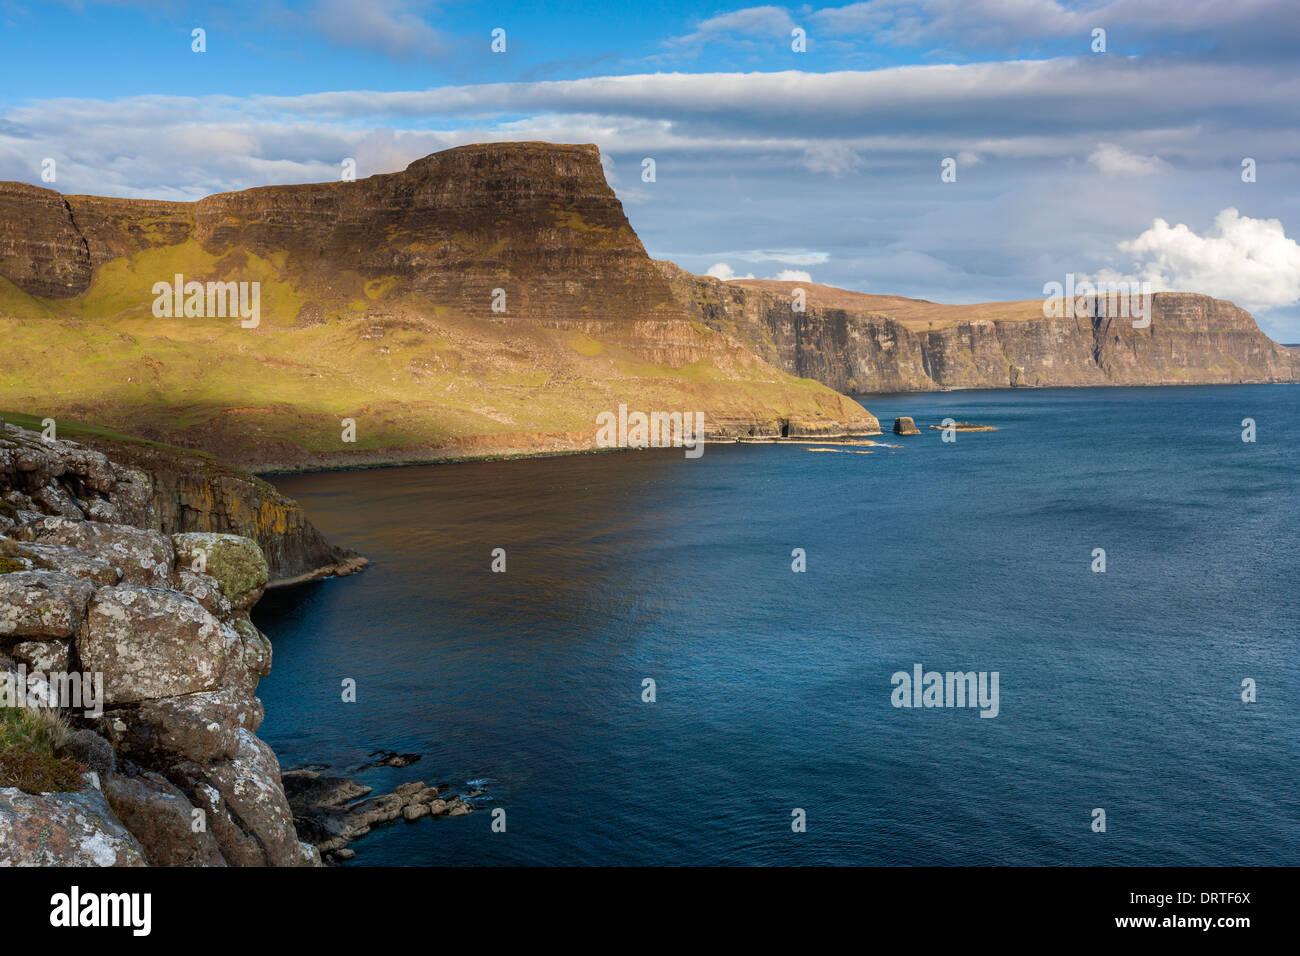 A view towards Waterstein Head and Ramasaig Cliffs, Moonen Bay, Isle of Skye, Inner Hebrides, Scotland, UK, Europe. Stock Photo